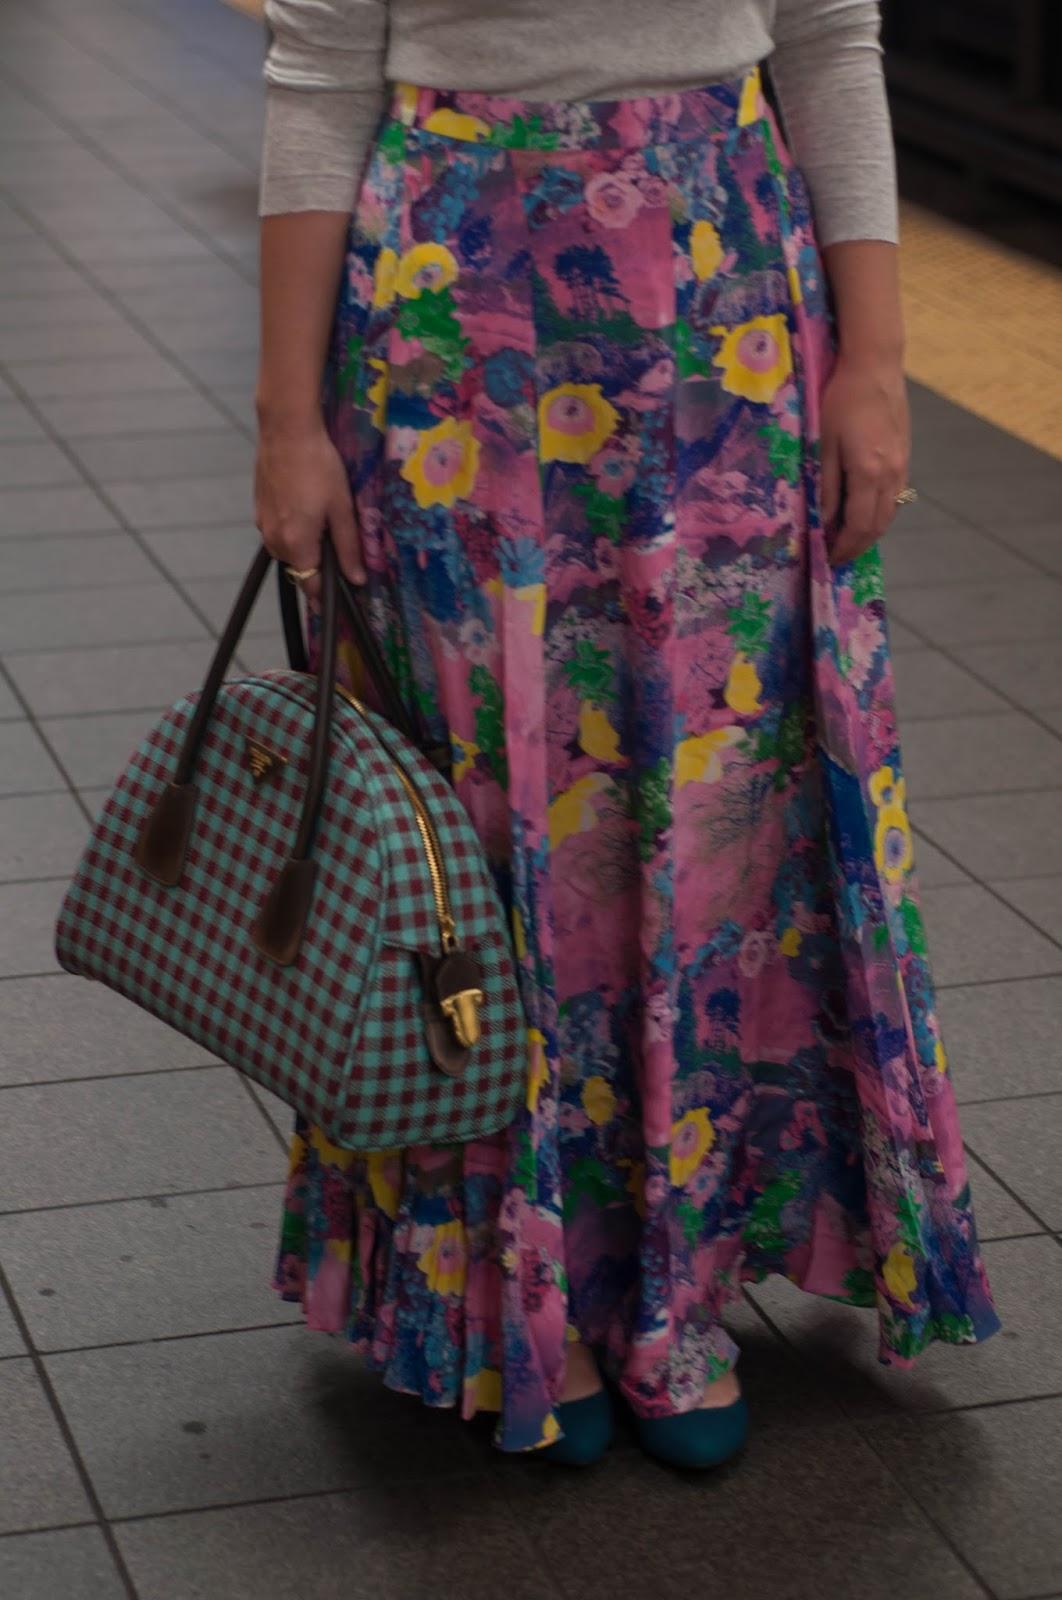 new york fashion week, street style, new york street style, new york fashion week street style, fashion blog, style blog